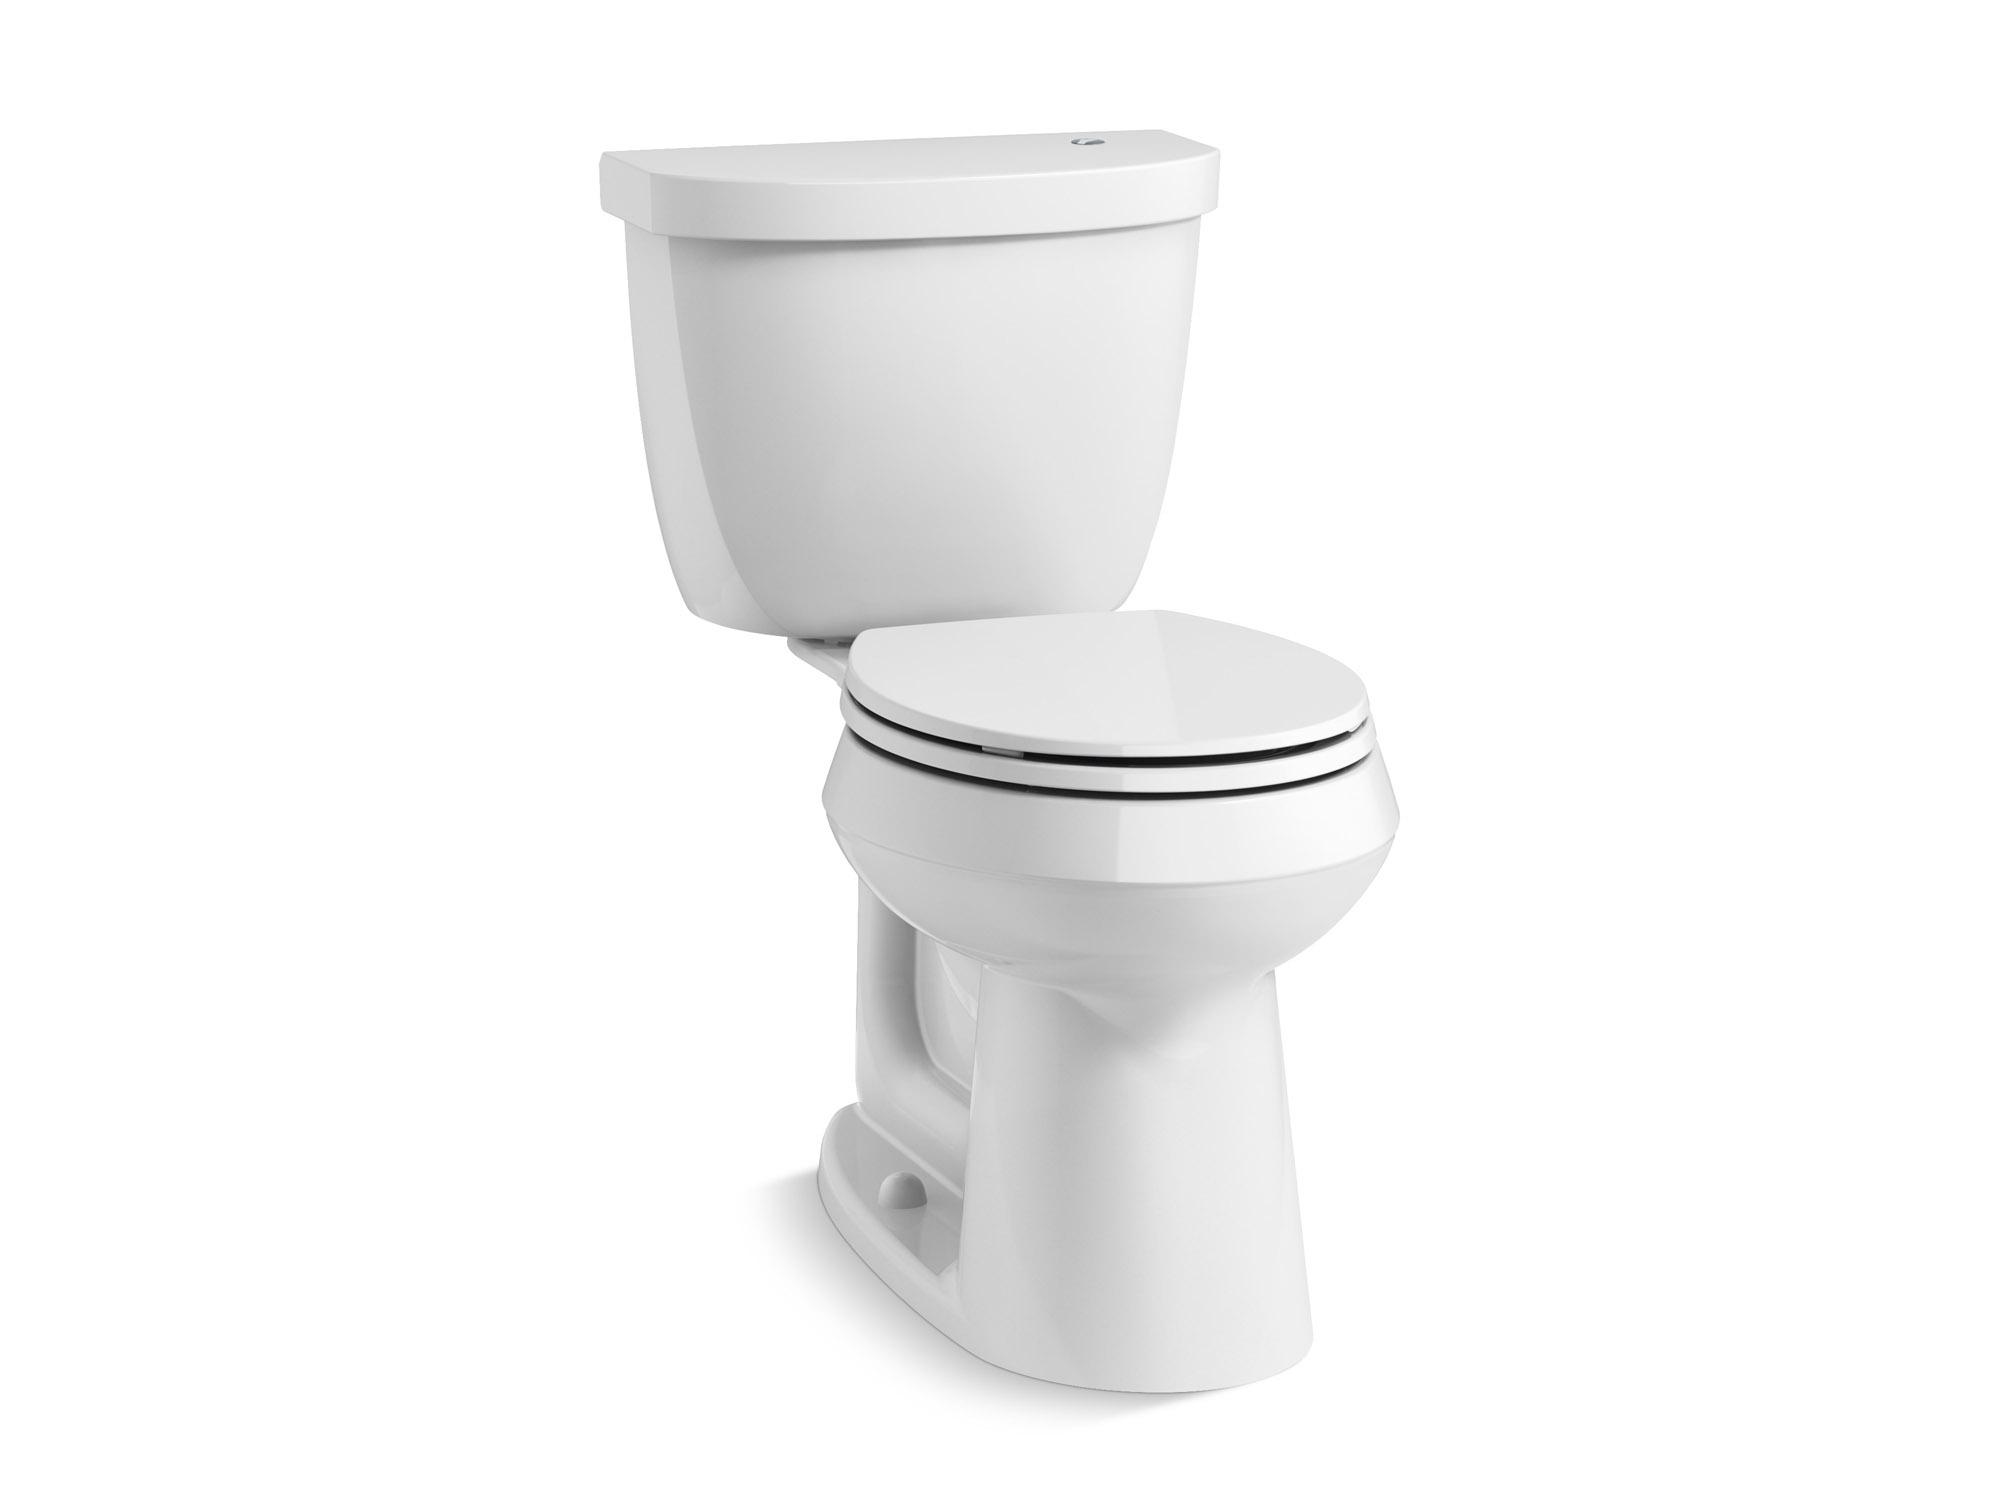 Kohler Cimarron Toilet 100 Lighted Toilet Seat Make Your Bathroom